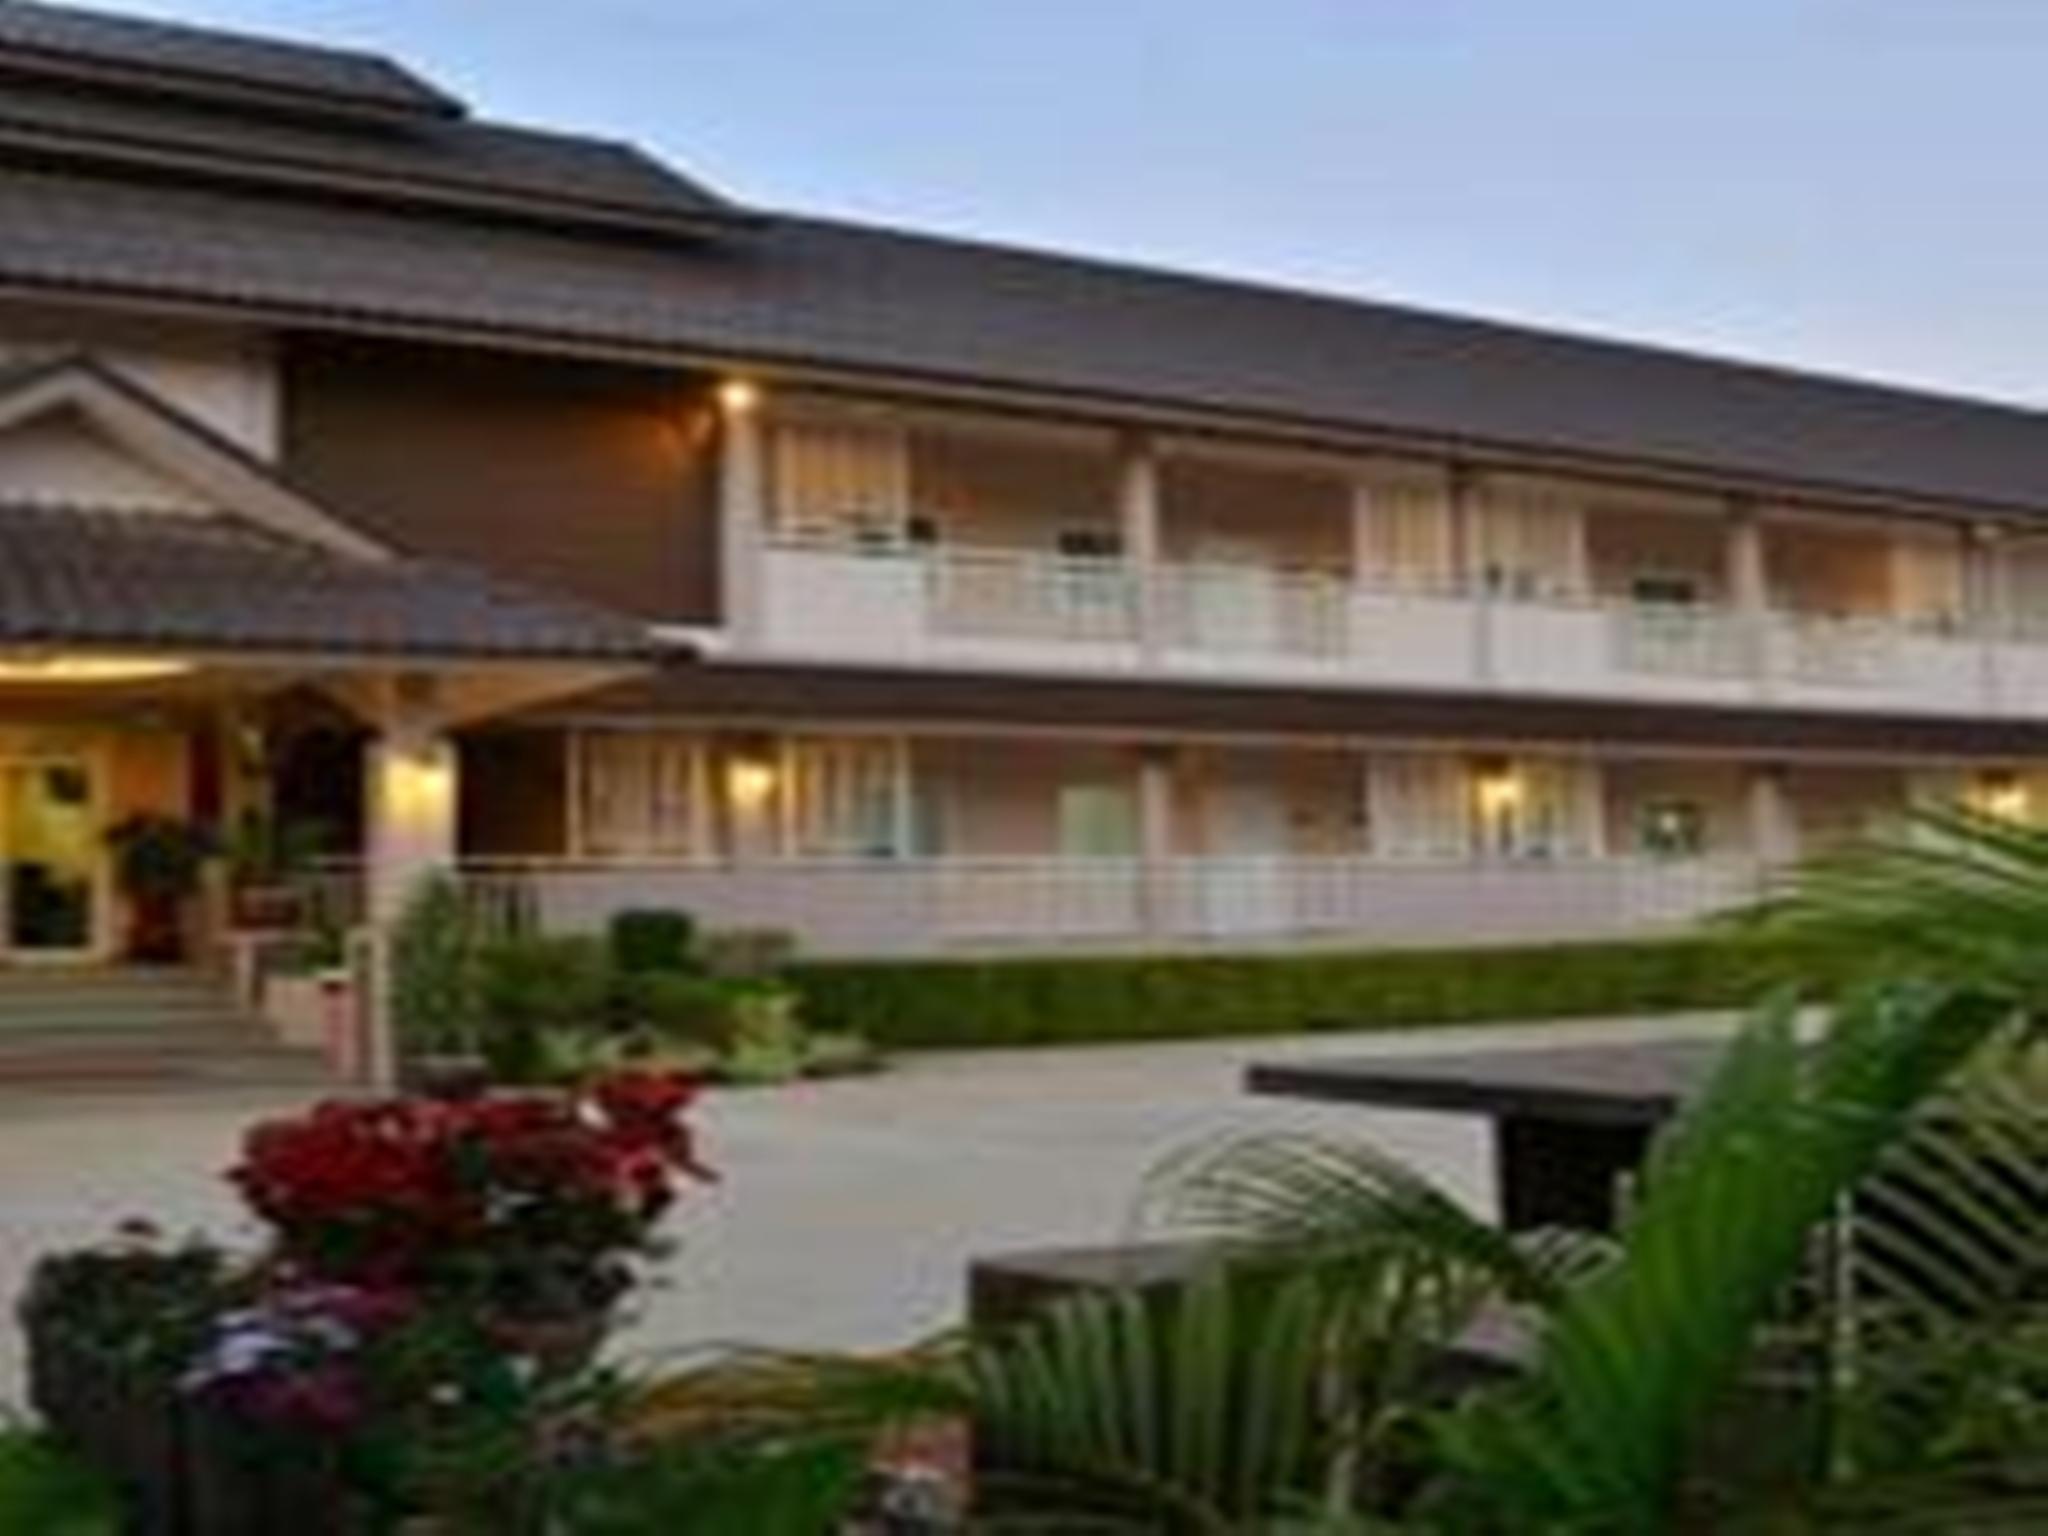 Chiangkham Grand Villa,เชียงคำ แกรนด์ วิลลา